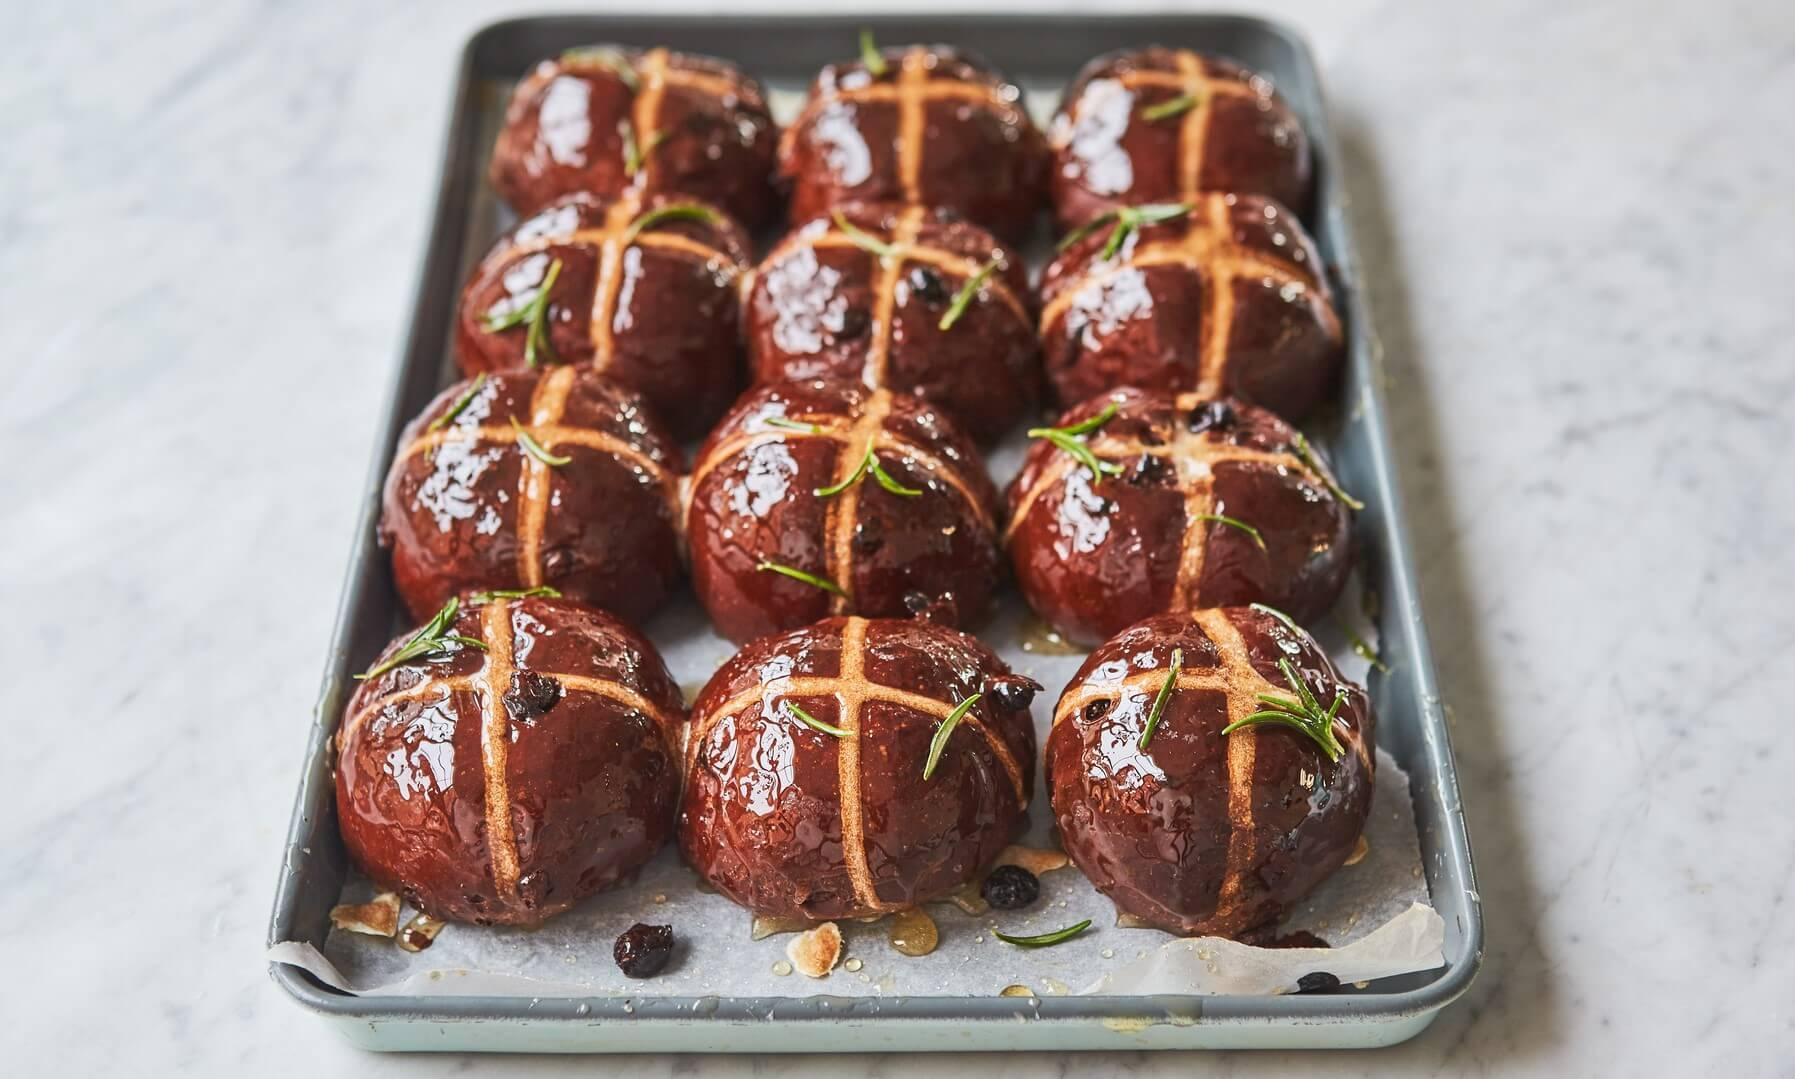 What do you need to make homemade hot cross buns?